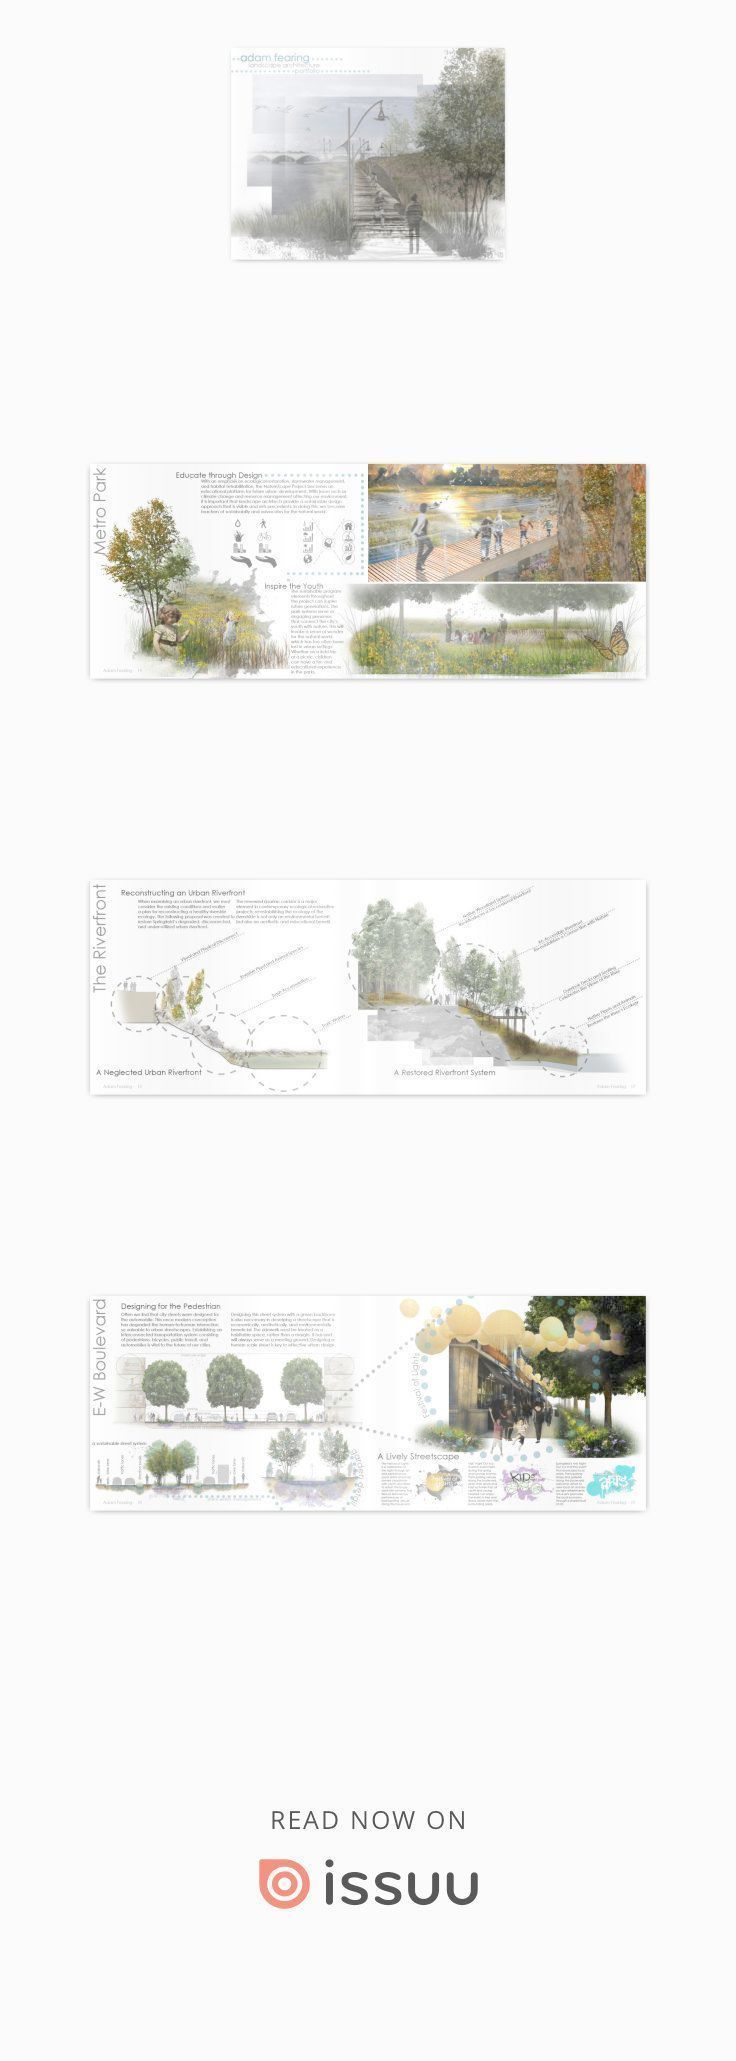 Landscape Gardening Courses Hampshire order Landscape